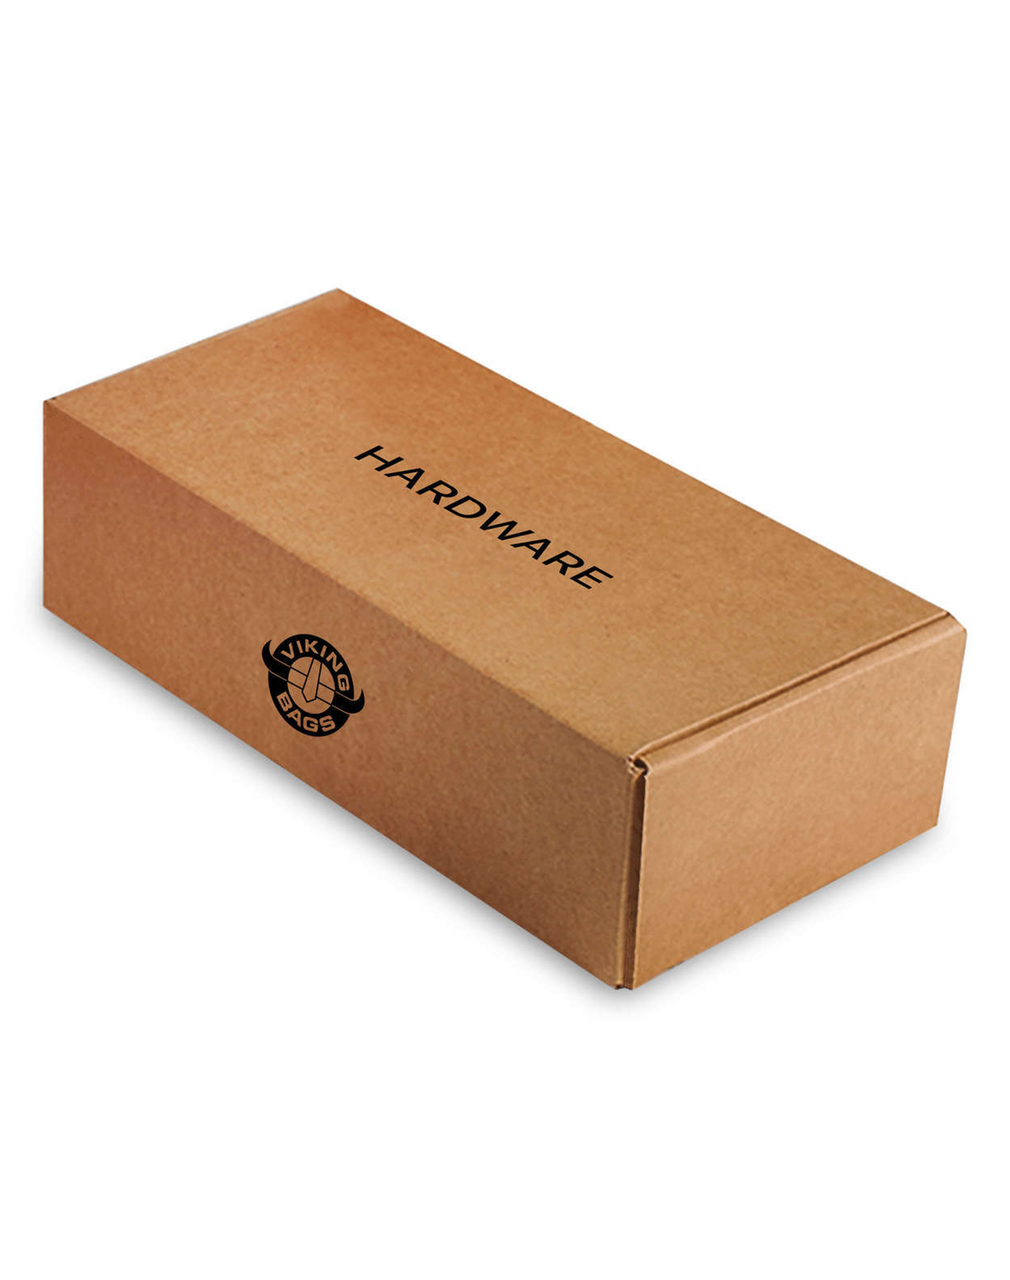 Honda 1100 Shadow Sabre Viking Odin Medium Motorcycle Saddlebags Hardware Box